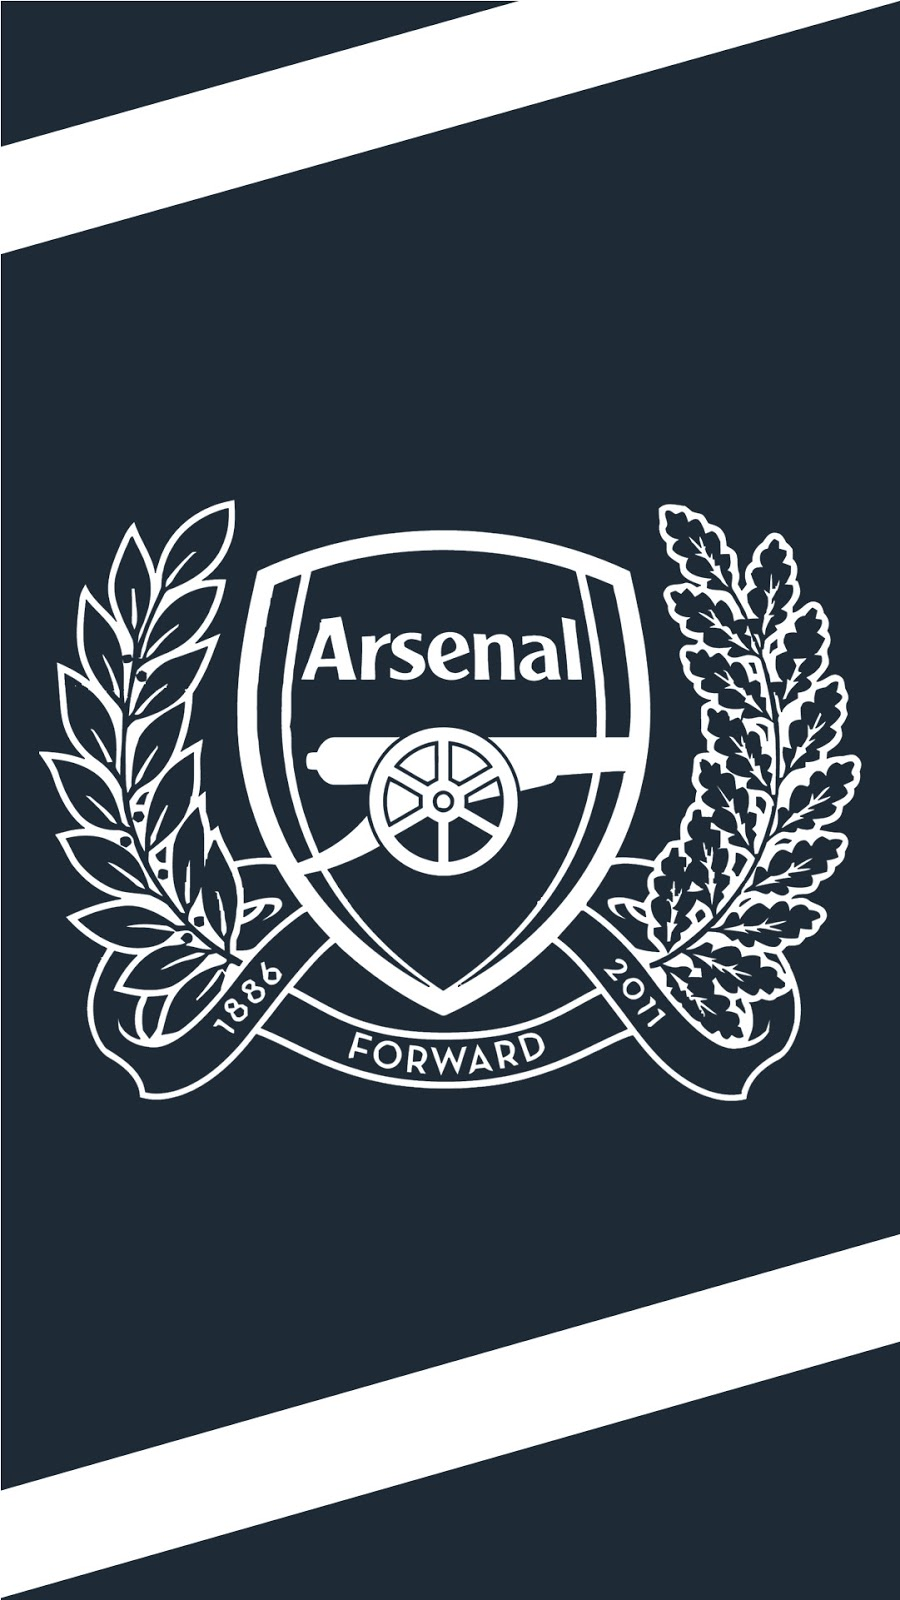 Arsenal Fc Wallpapers Hd European Football Insider